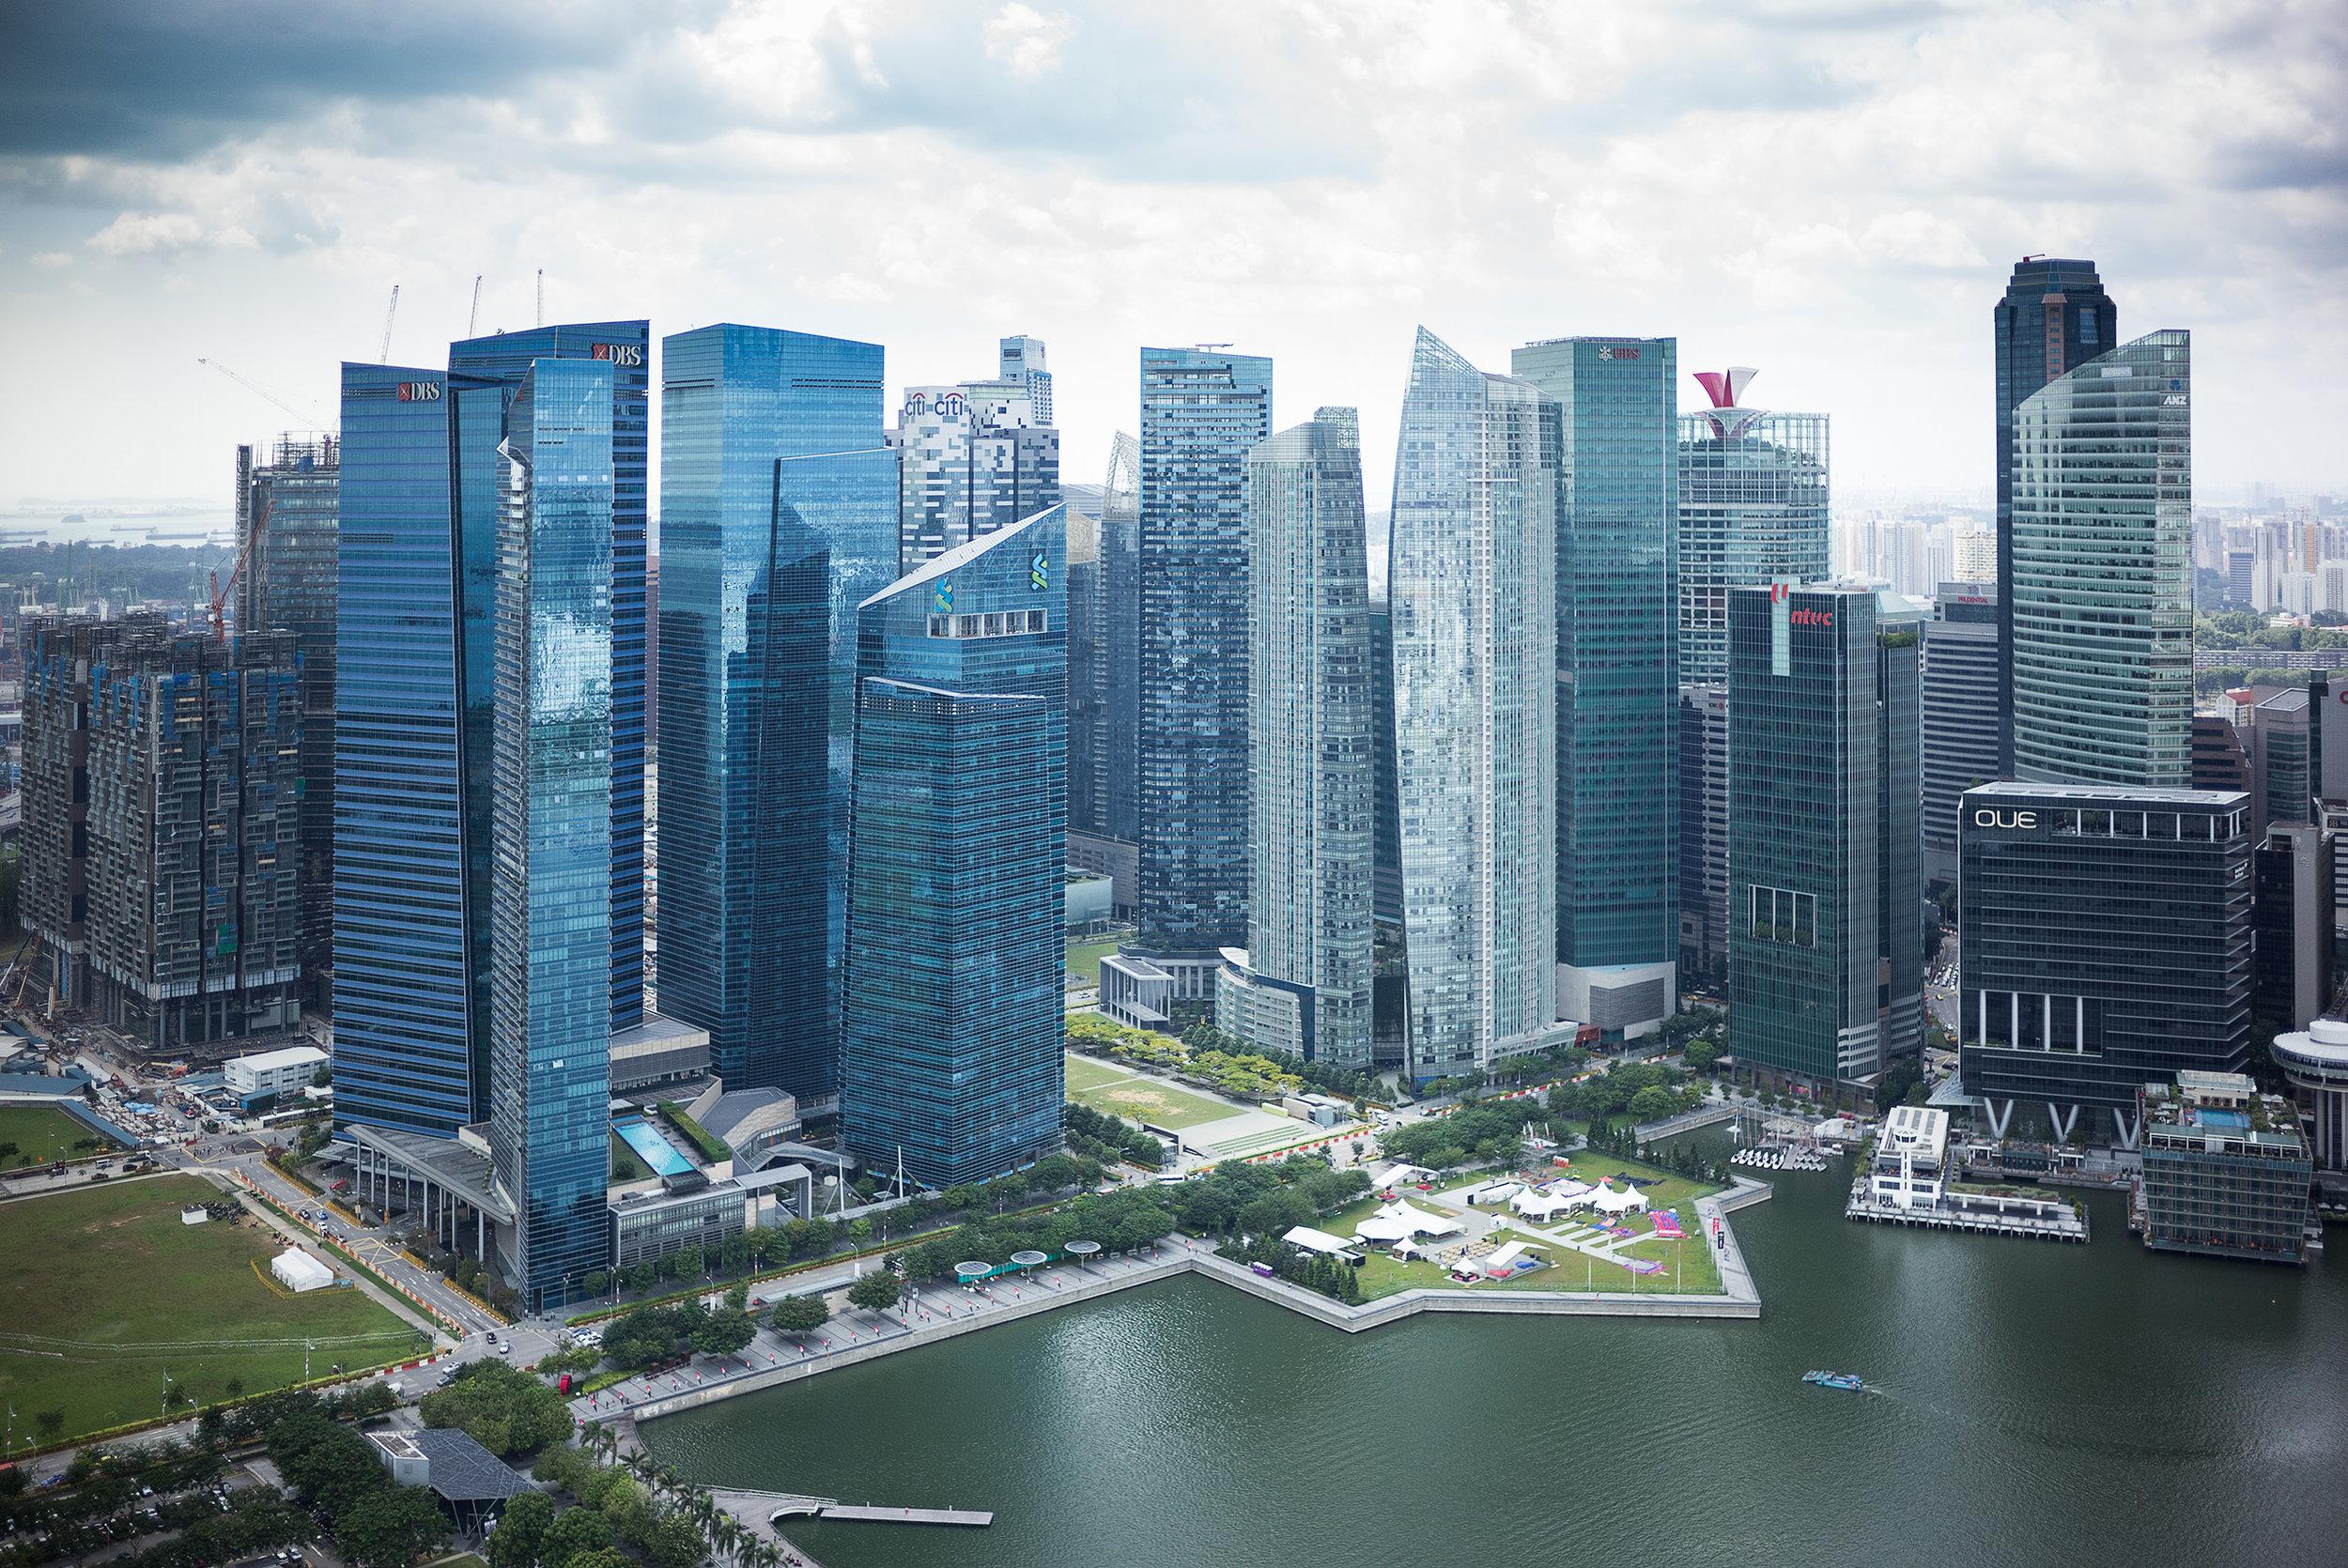 Singapur by Eric Berger - Leica MP